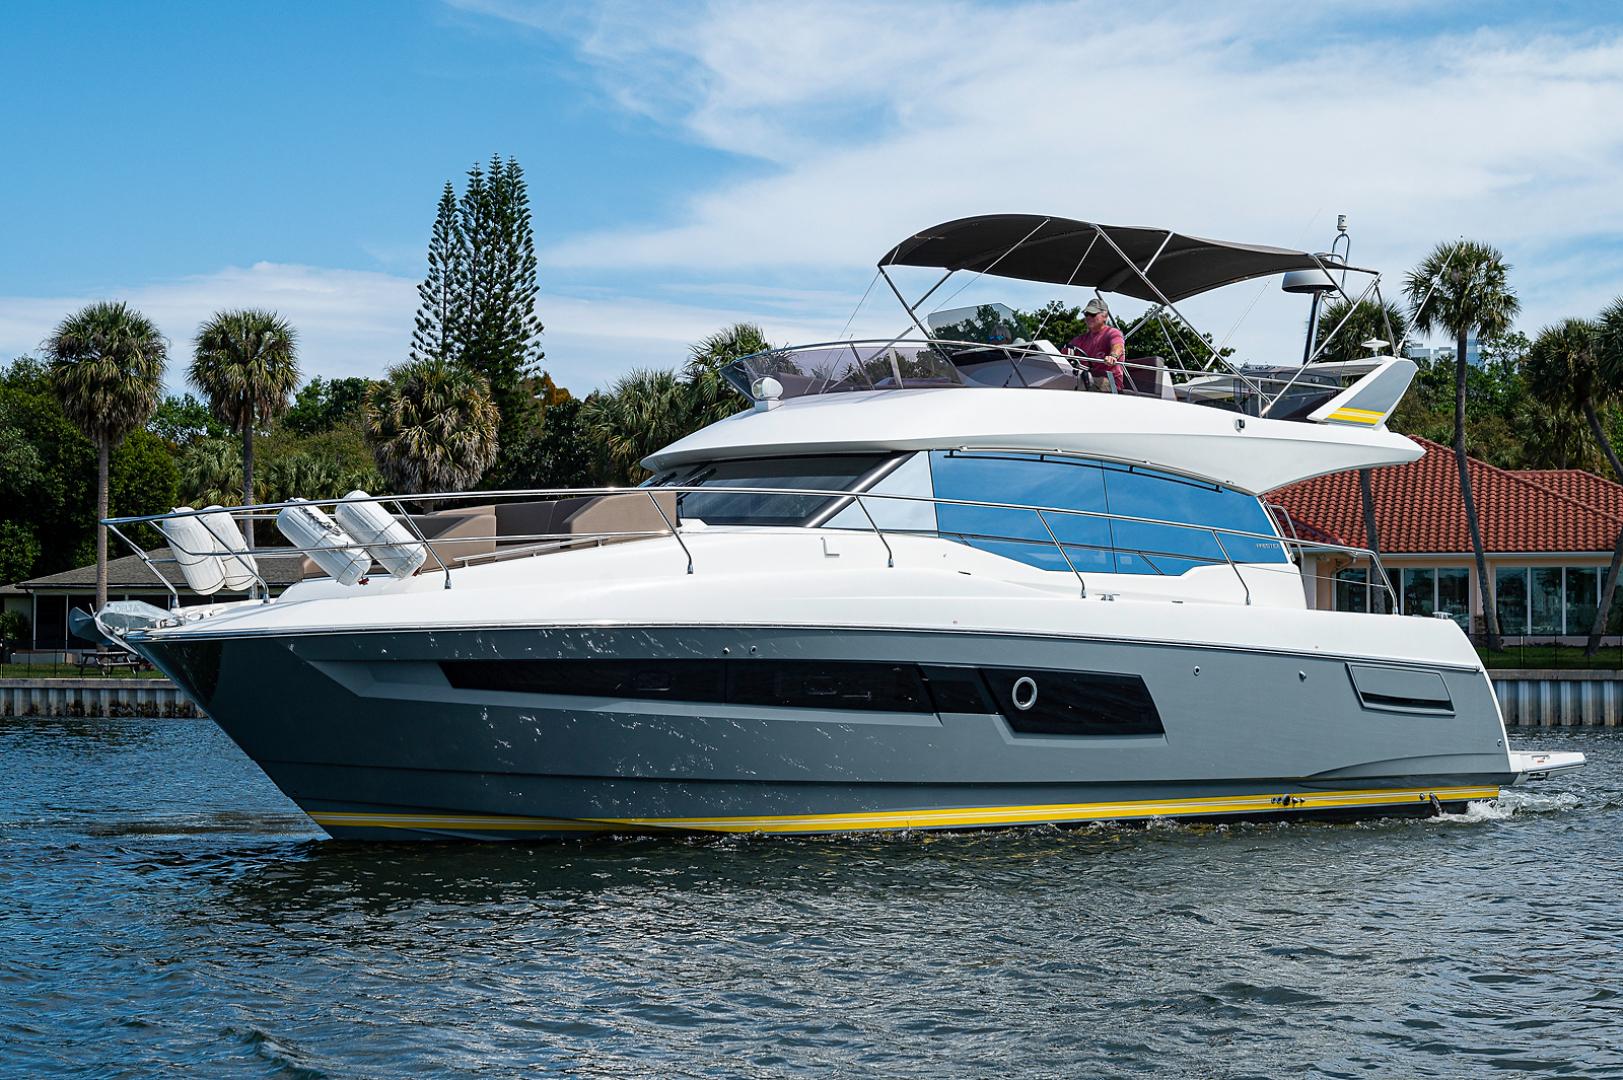 Prestige-460 Flybridge 2018-SEAQUEL Palm Beach Gardens-Florida-United States-Port Side -1351133 | Thumbnail